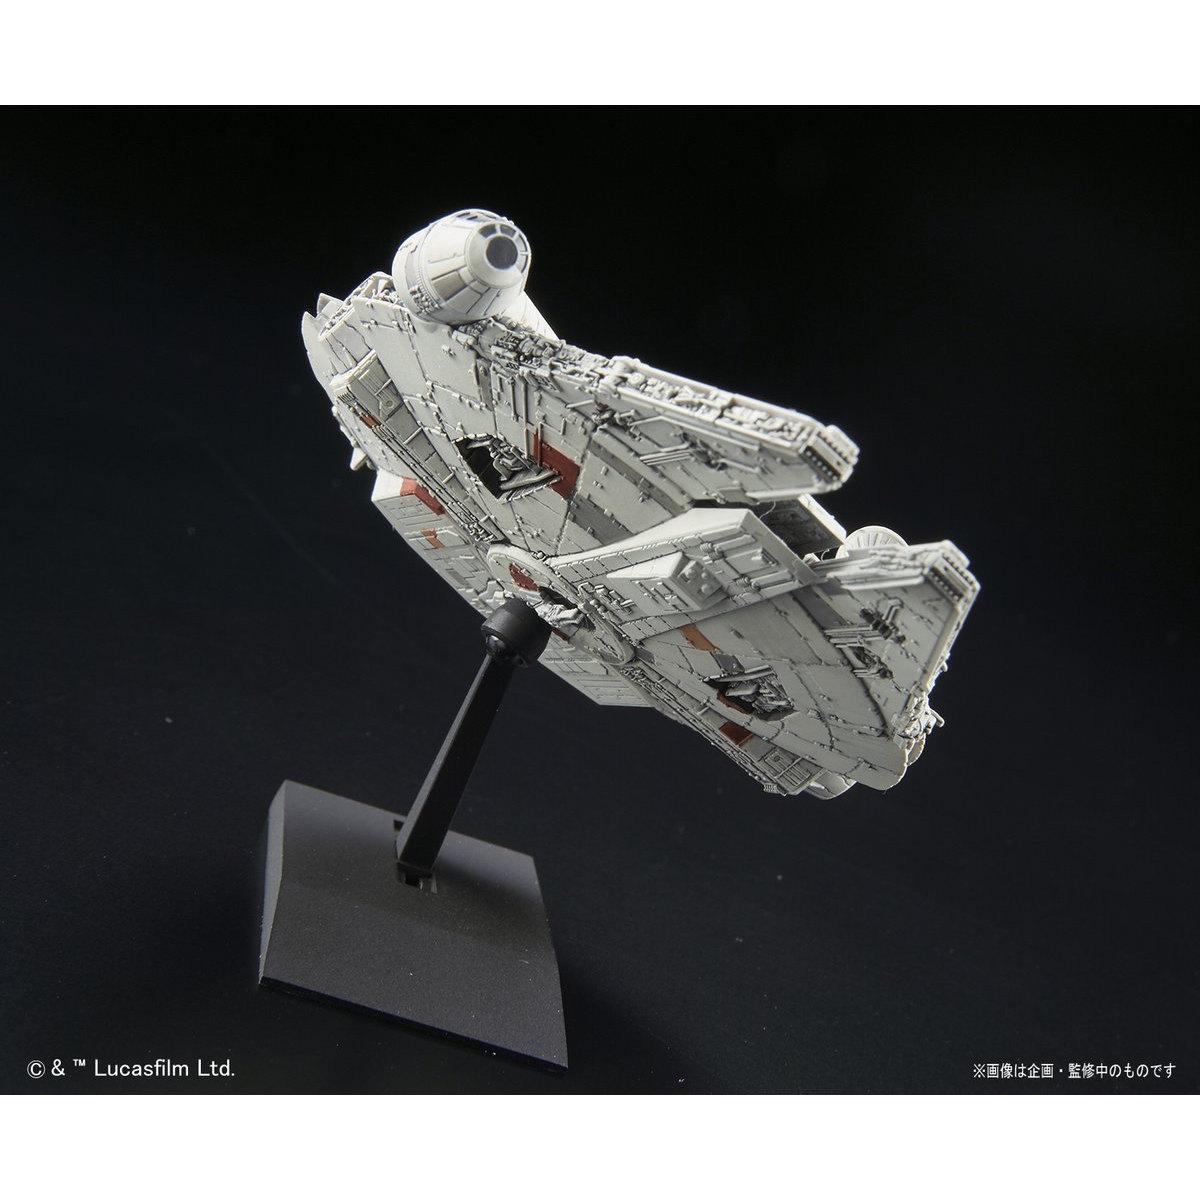 Star Wars: Vehicle Model 006 Millennium Falcon - Model Kit image